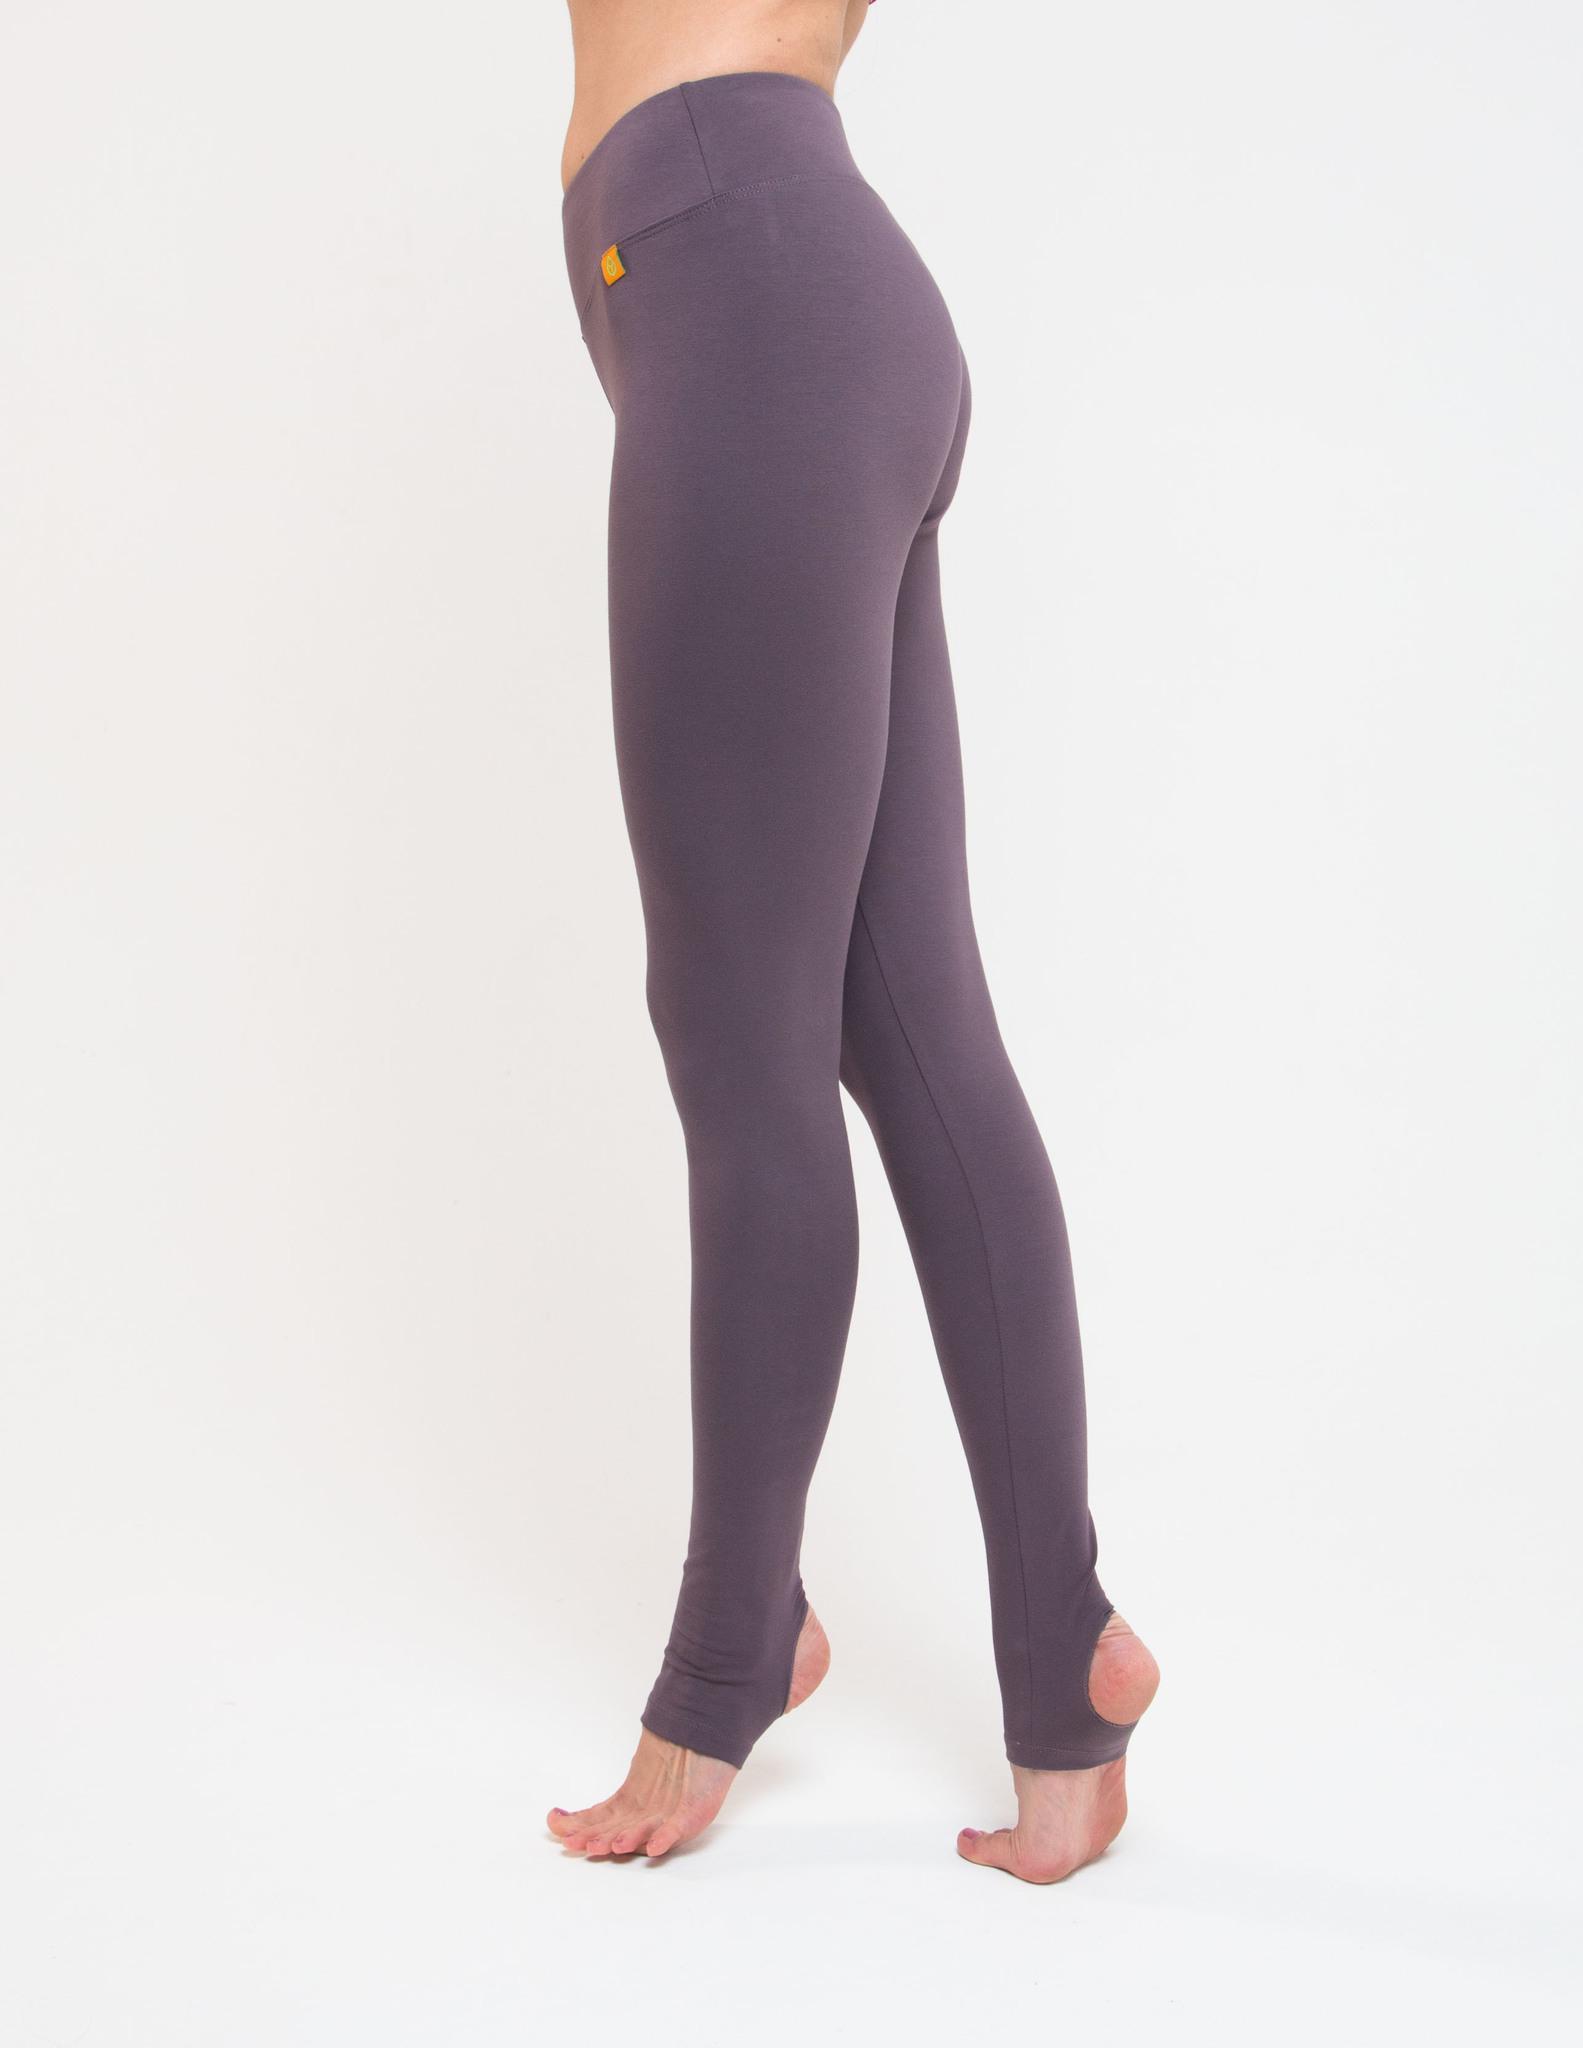 Тайтсы женские c открытой пяткой Miss Incredible YogaDress (0,3 кг, XL (50), серый / какао)